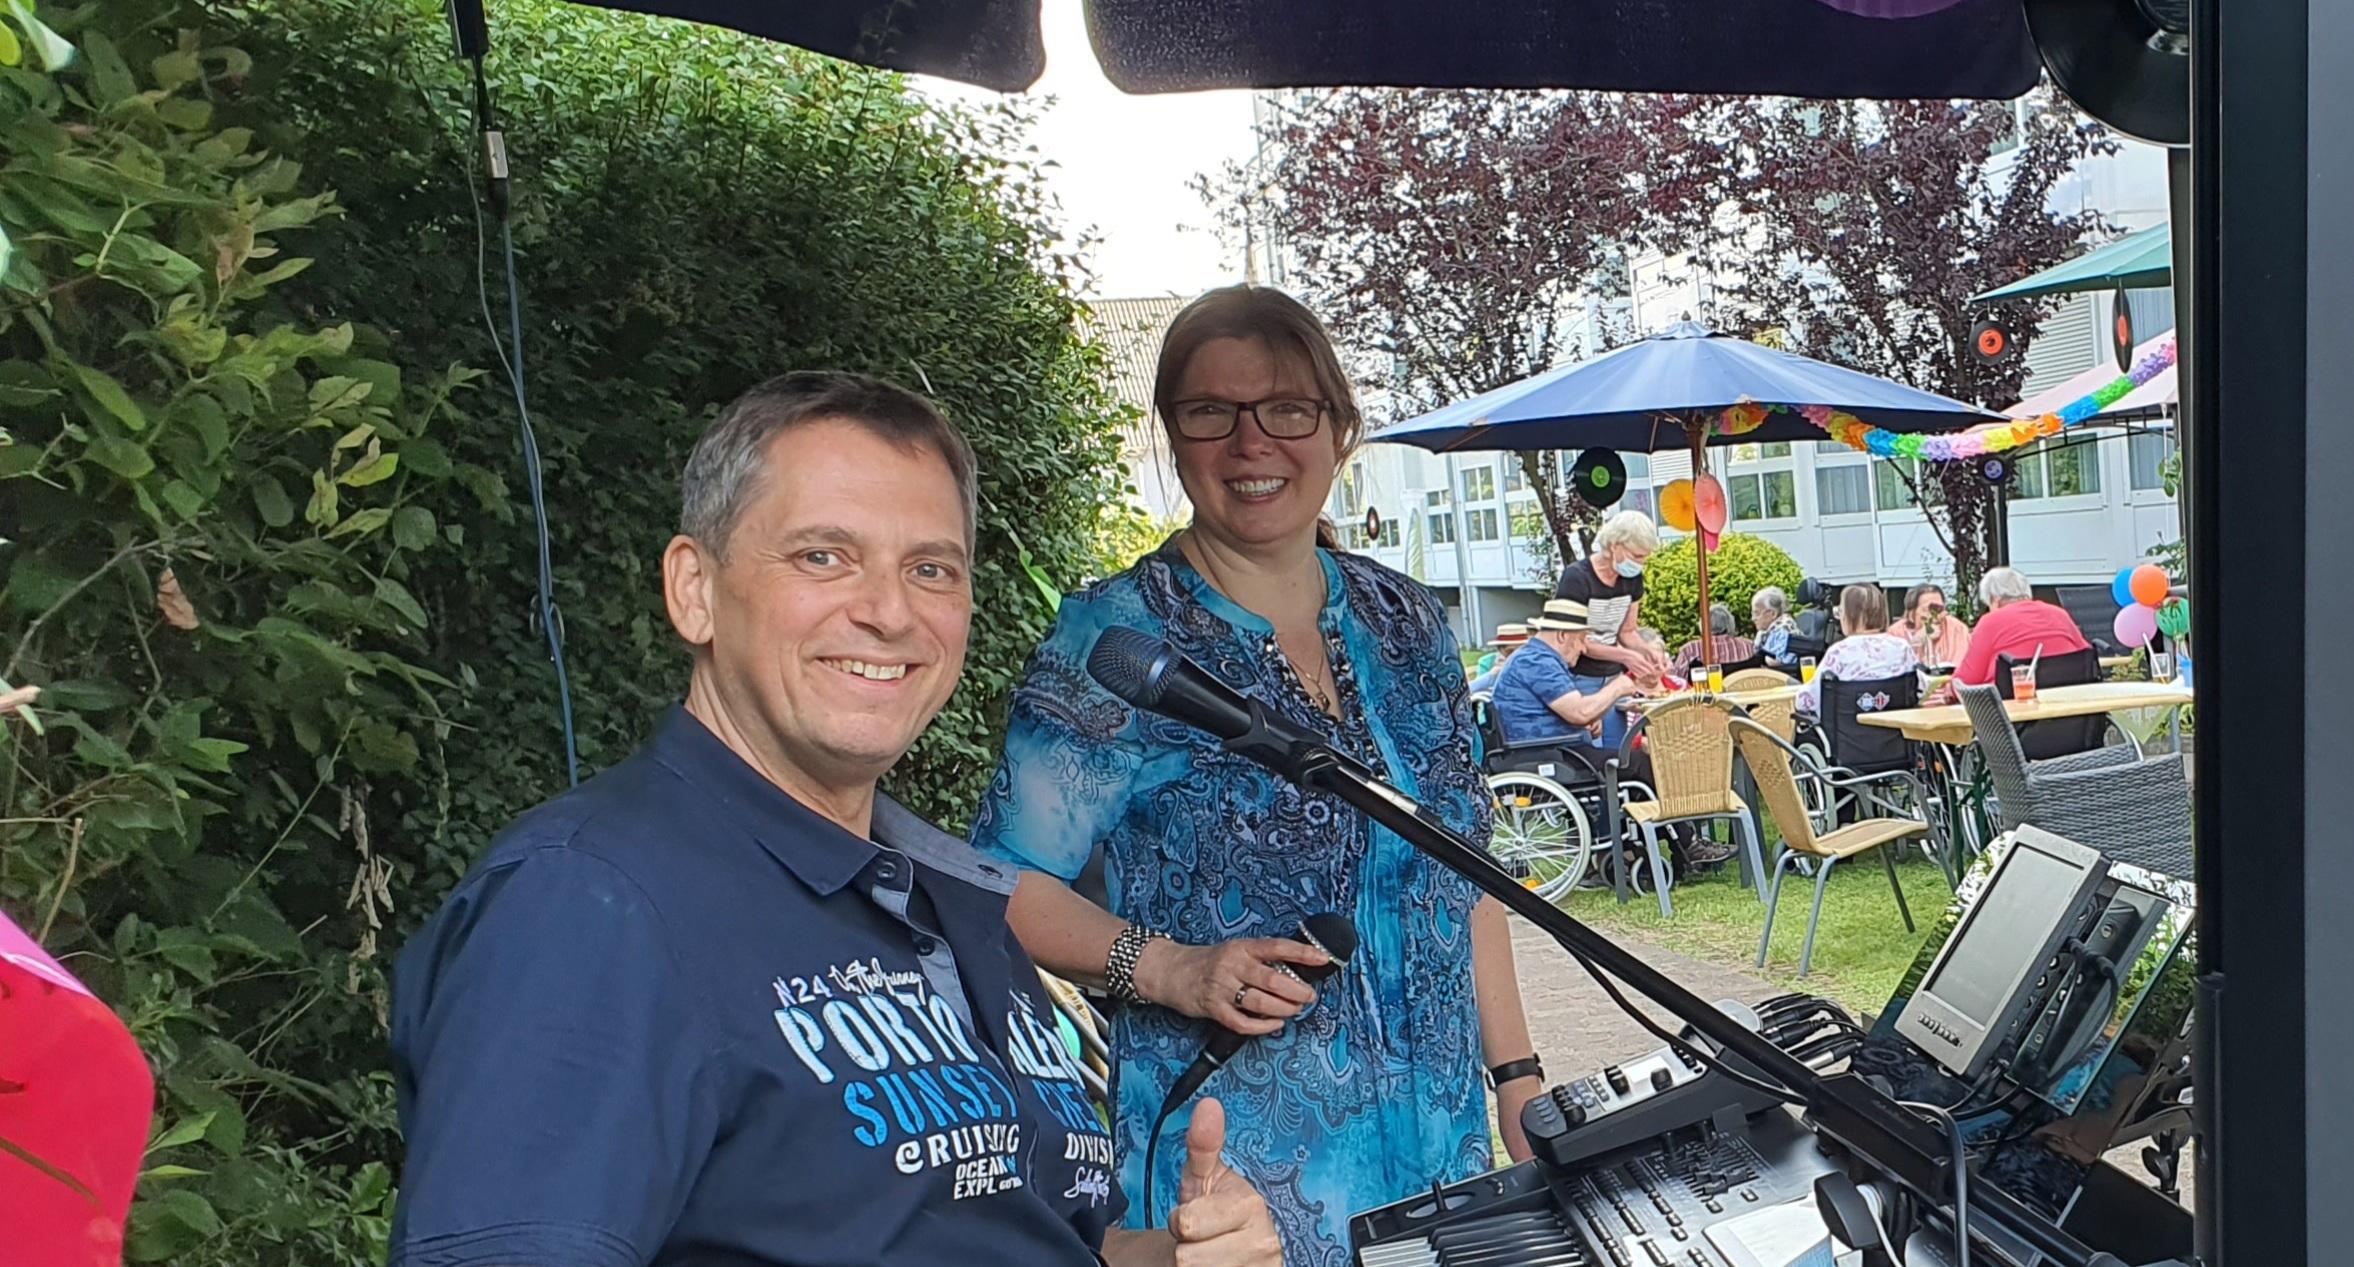 Musik Duo in Hamm – Sommerfest St. Bonifatius 2021